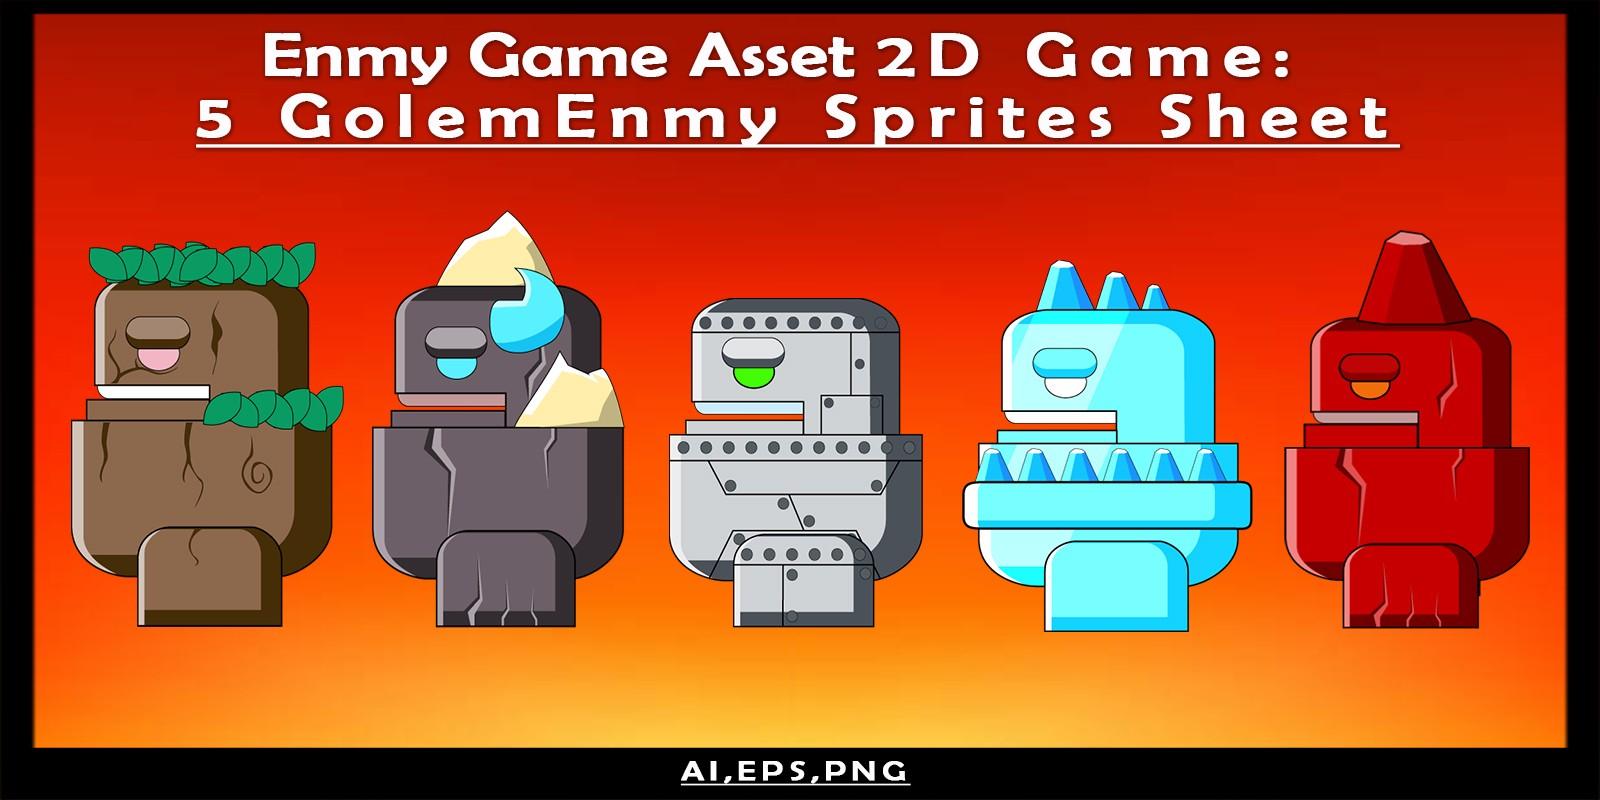 Enmy Game Asset 2D Game: 5 Golem Enmy Sprites